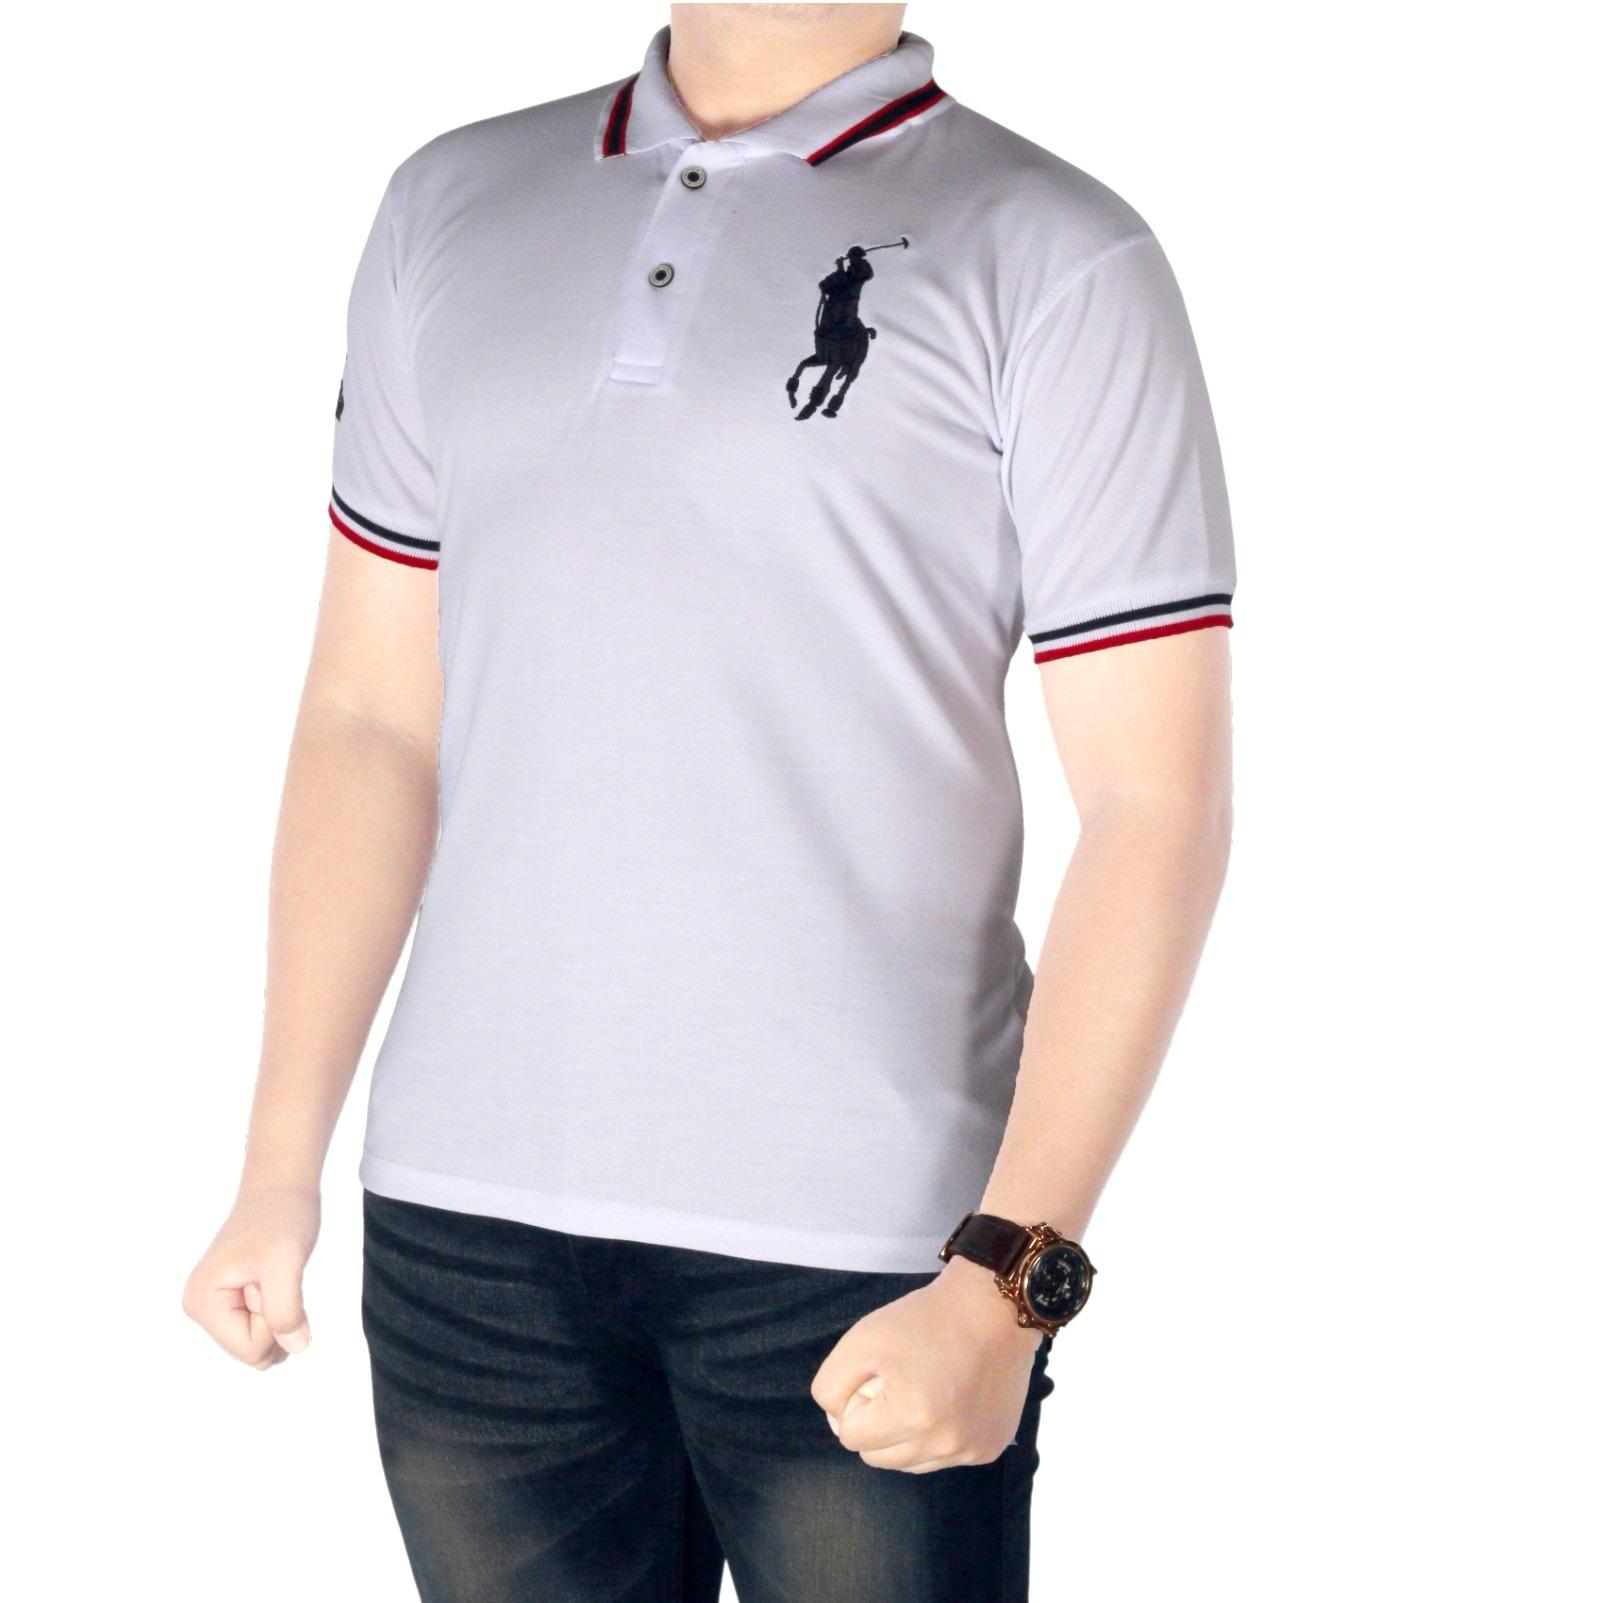 Beli Barang Dgm Fashion1 Kaos Polo Pria Putih Kuda Kaos Polo Kerah Polo Kaos Polo Men Poloshirt Baju Kaos Kaos Distro Polo Distro Kaos Murah Kaos Casual Kaos Polos Polo Polos Ip 4547 Online